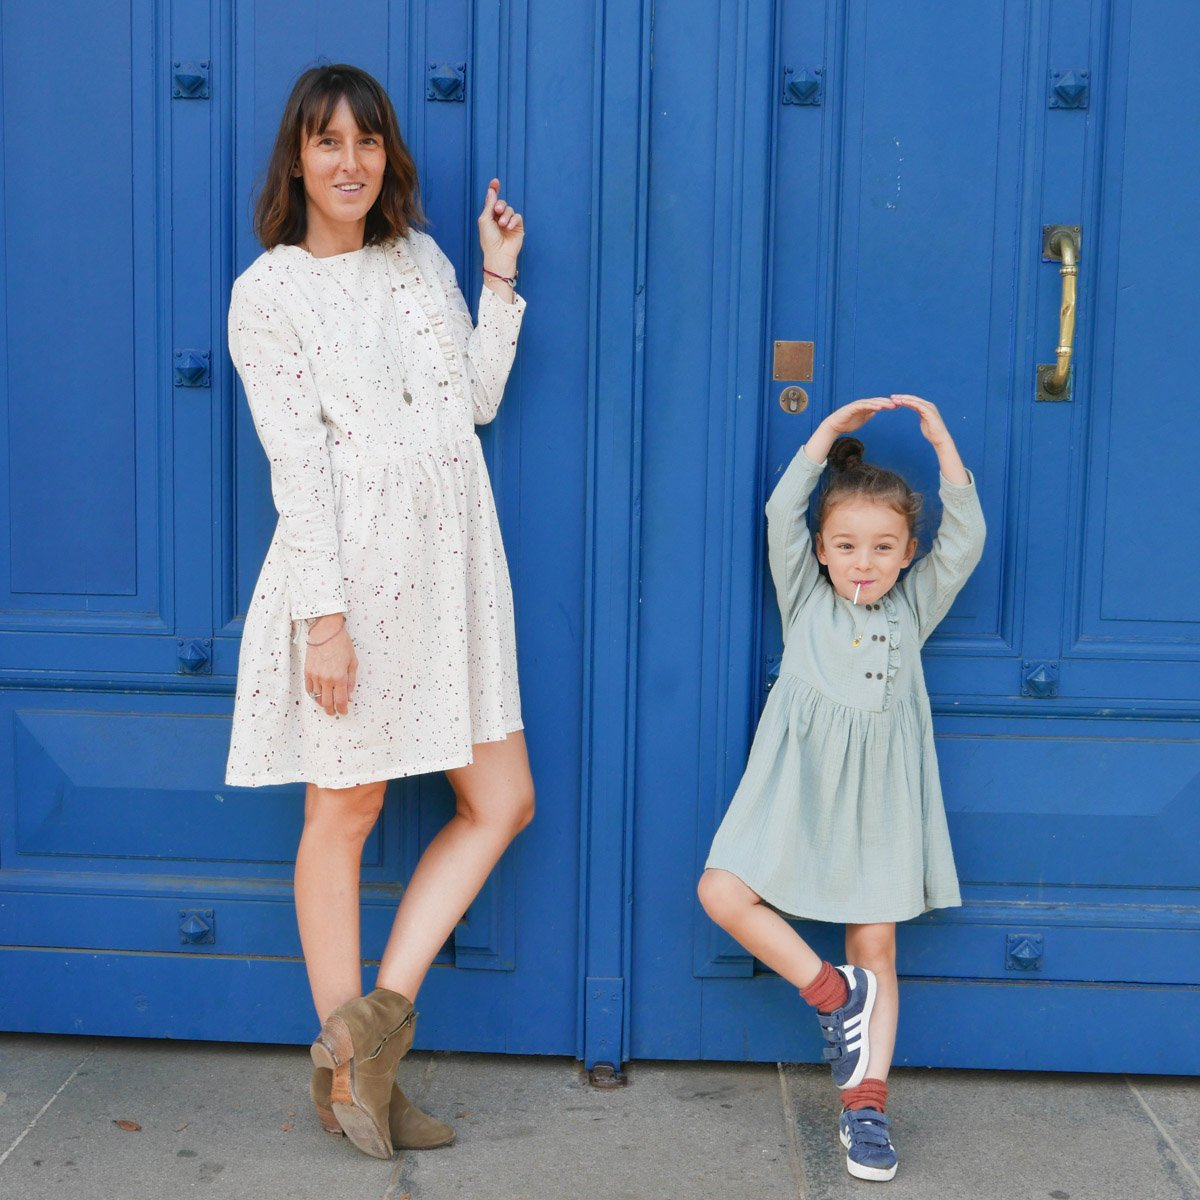 patron duo mère-fille - robe Elona d'Ikatee